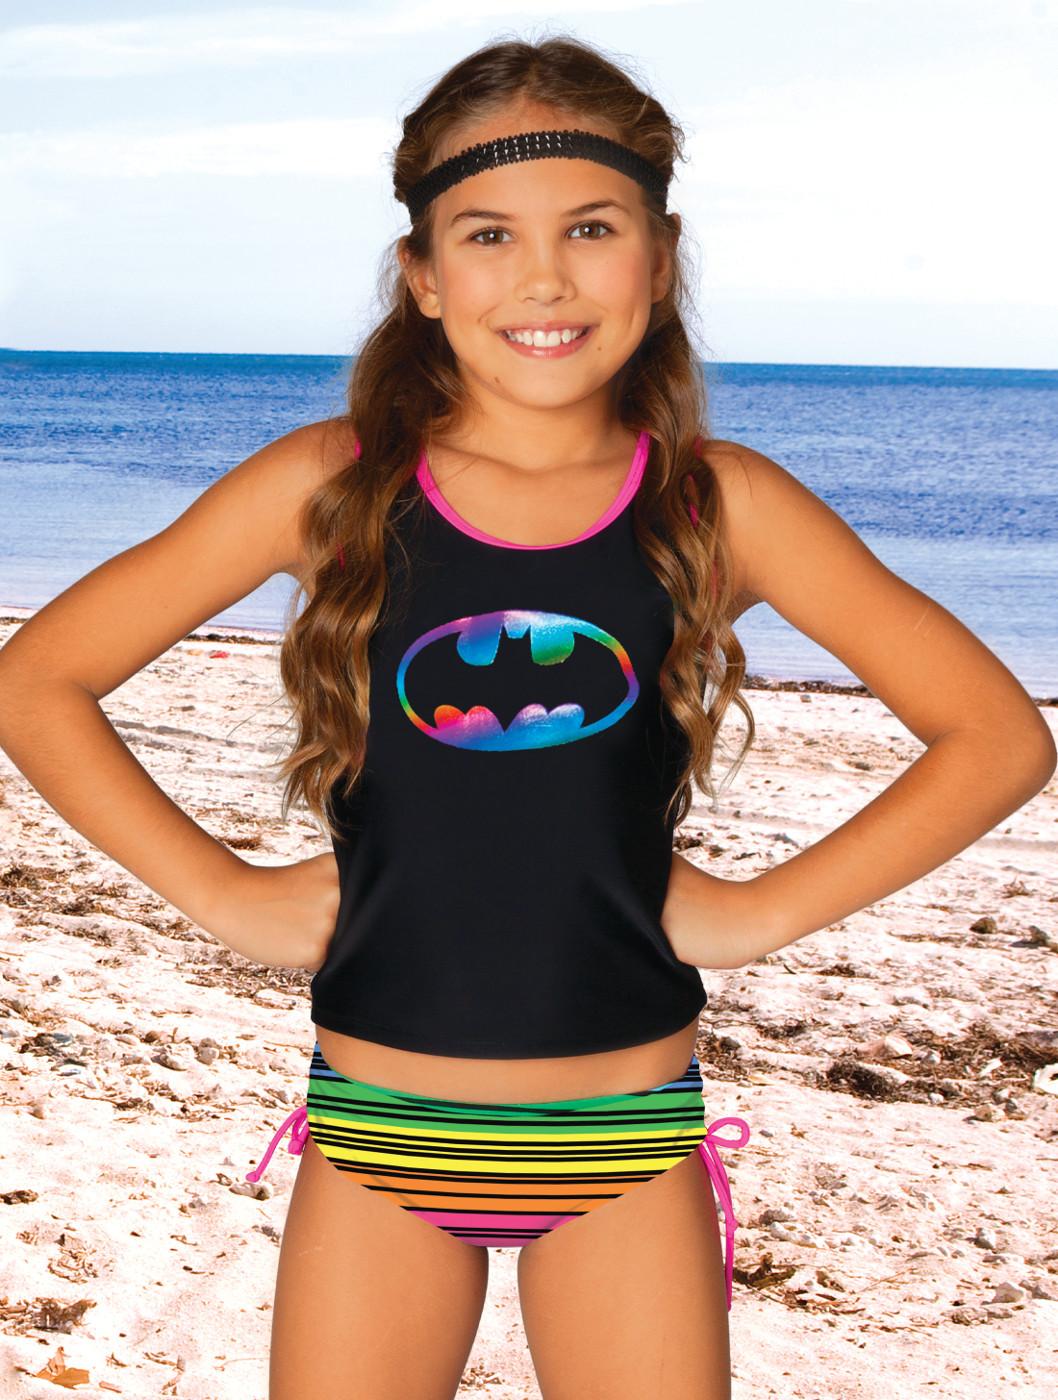 girls beachwear wallpapers high quality download free